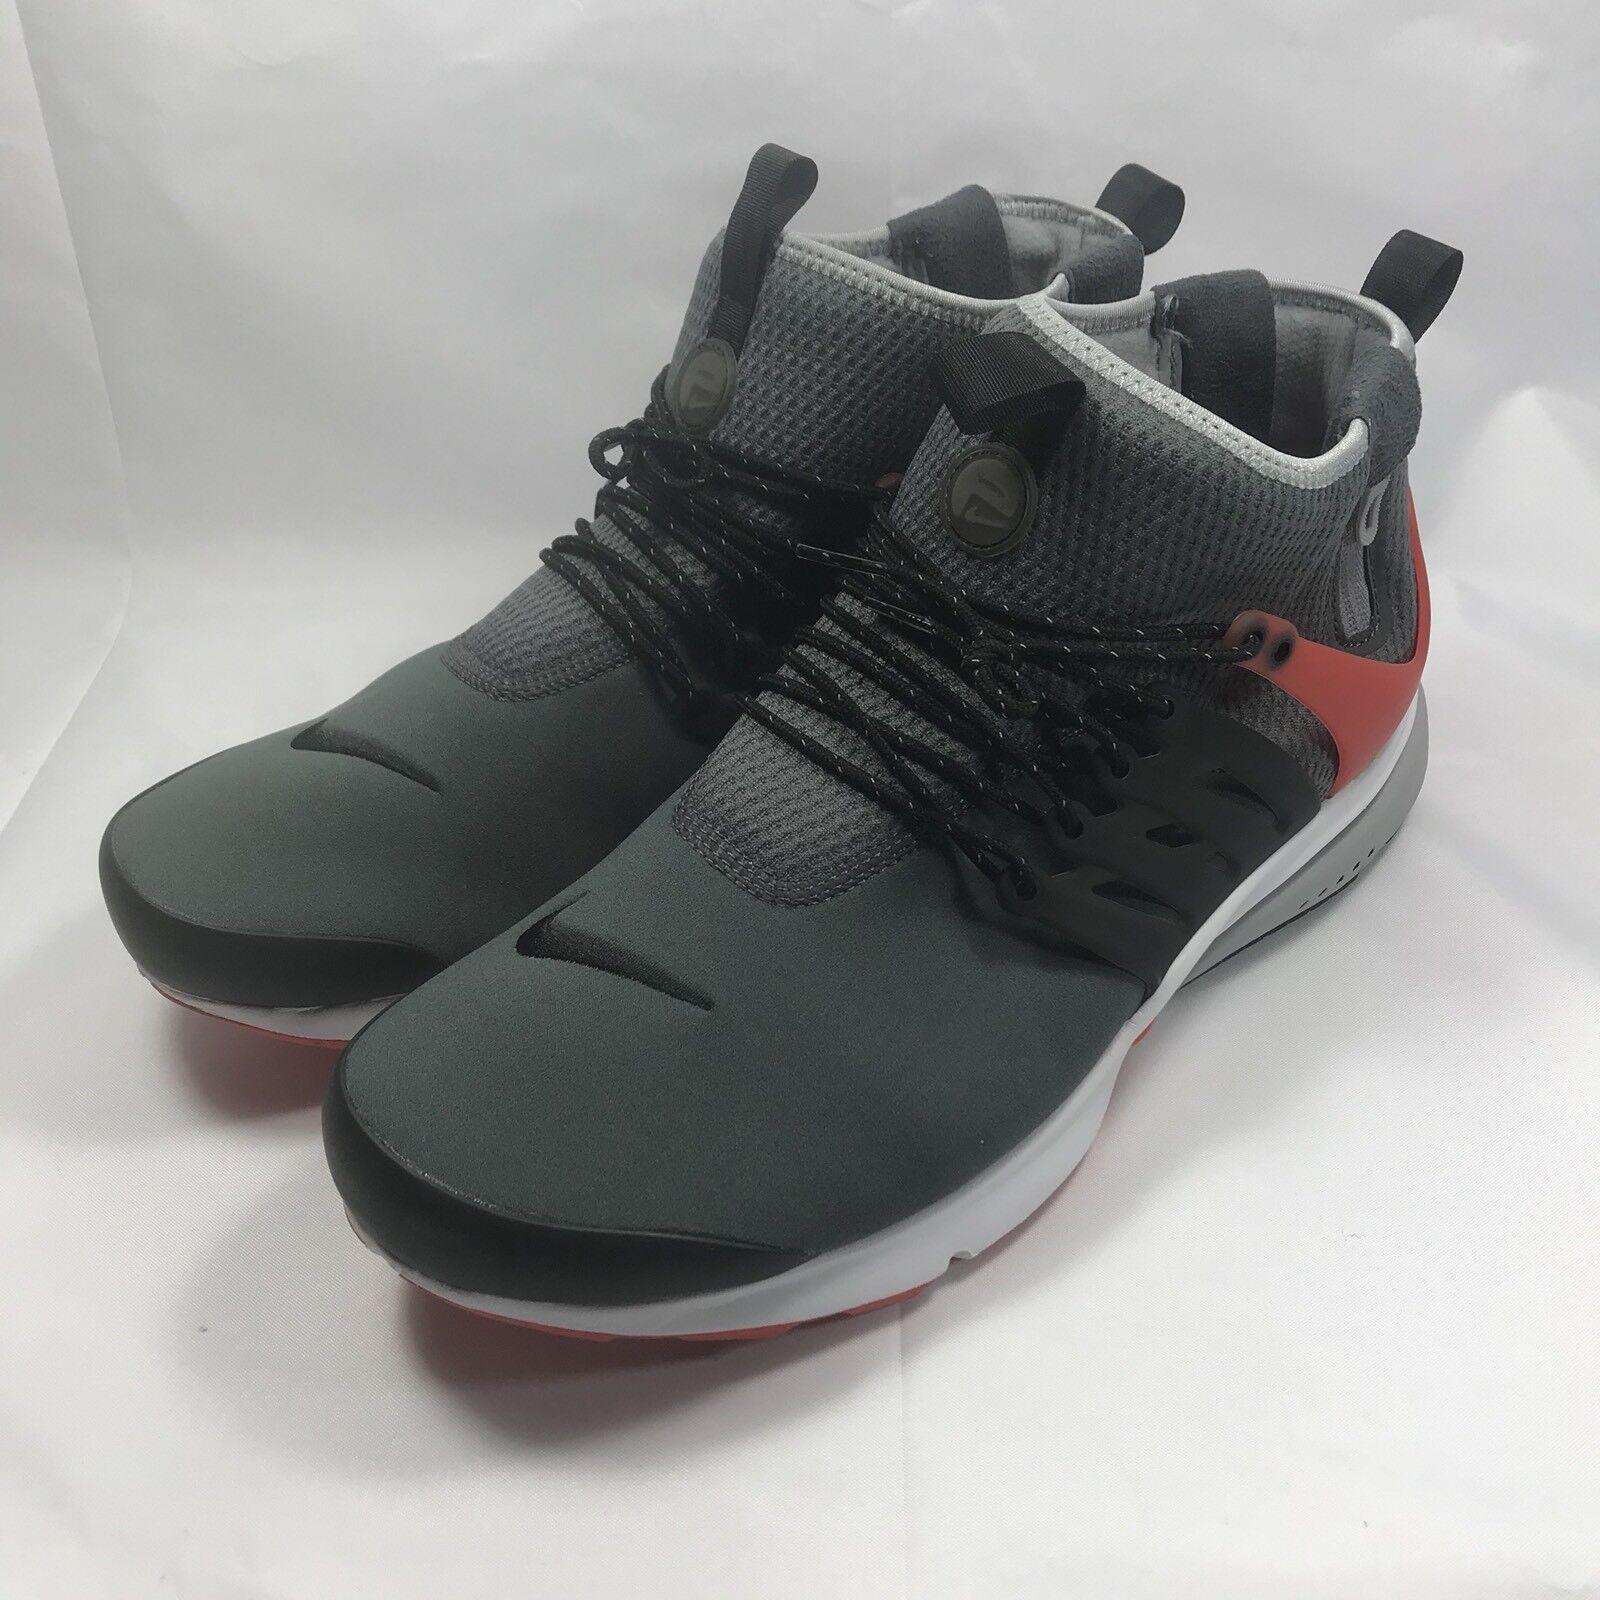 Nike air max hopp mitte utility dunkelgrau orange schwarzen schuh größe. 59ff67933b